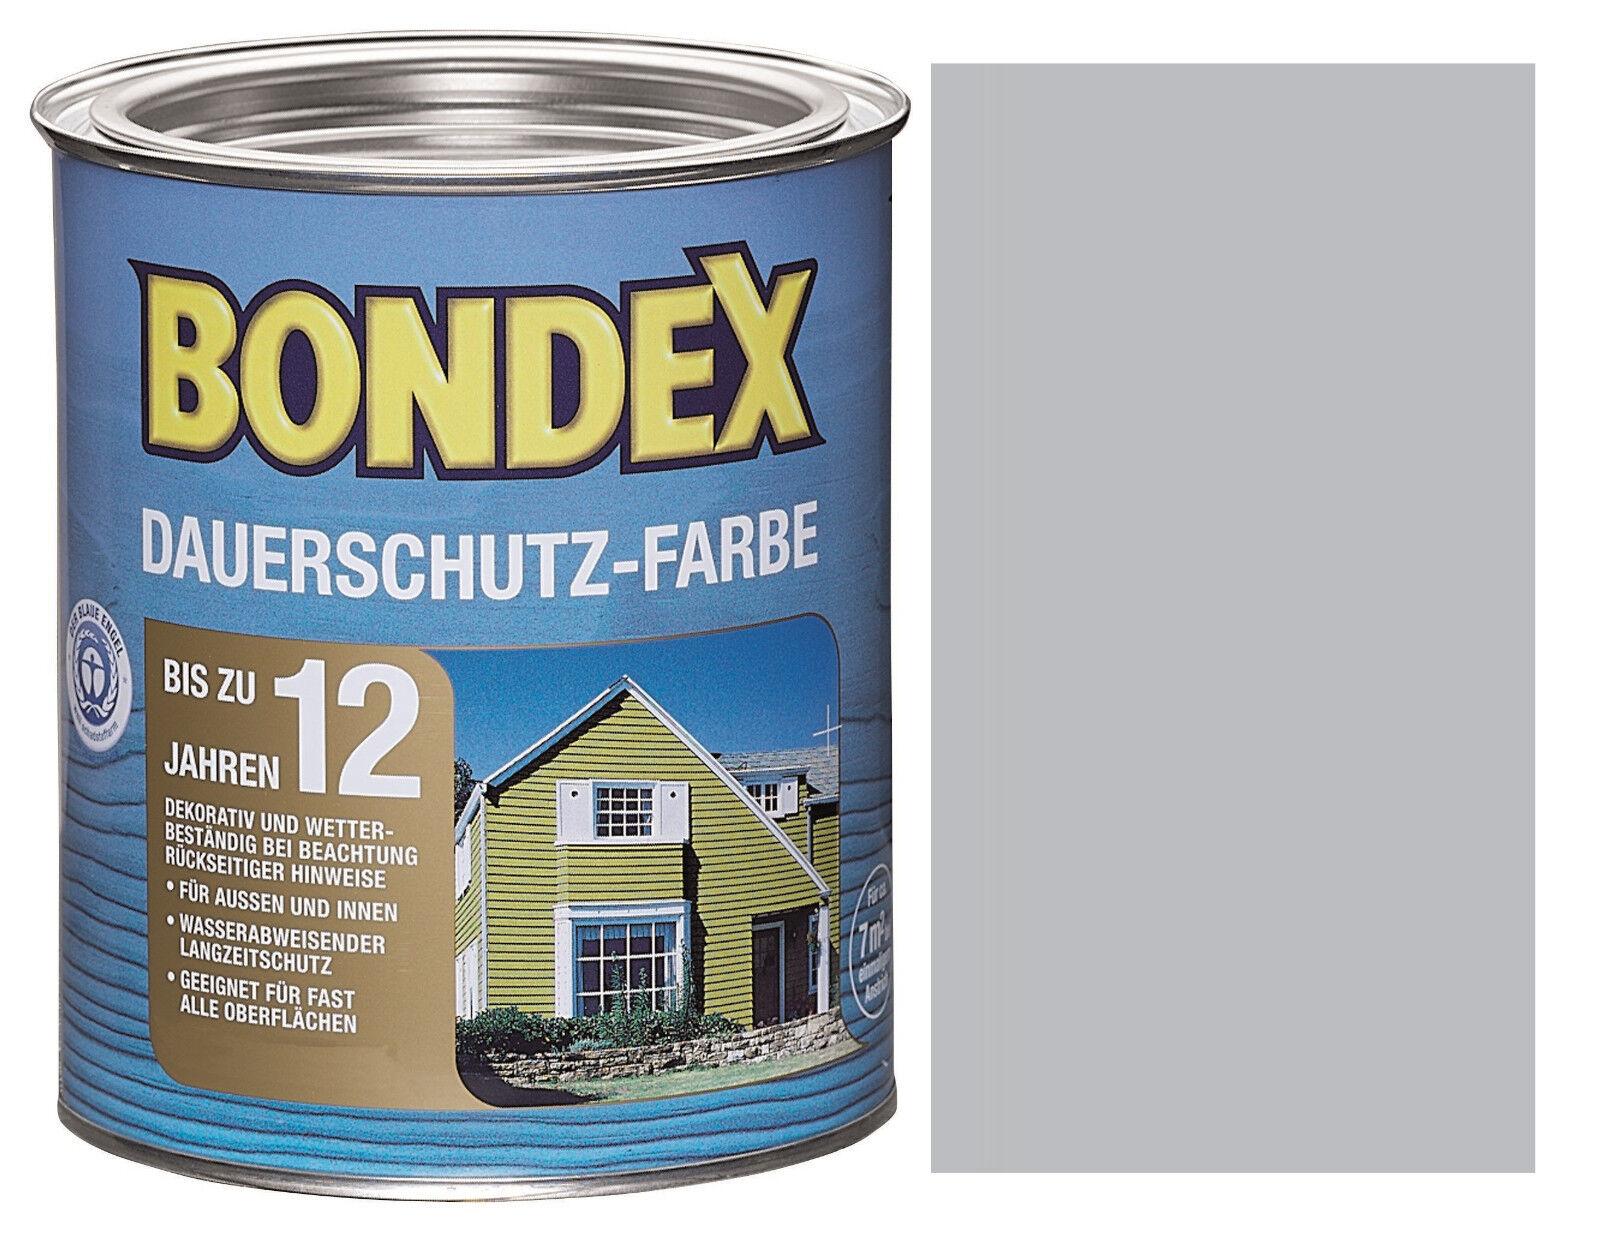 bondex dauerschutzfarbe silbergrau 750ml dauerschutz farbe holzfarbe holzschutz ebay. Black Bedroom Furniture Sets. Home Design Ideas